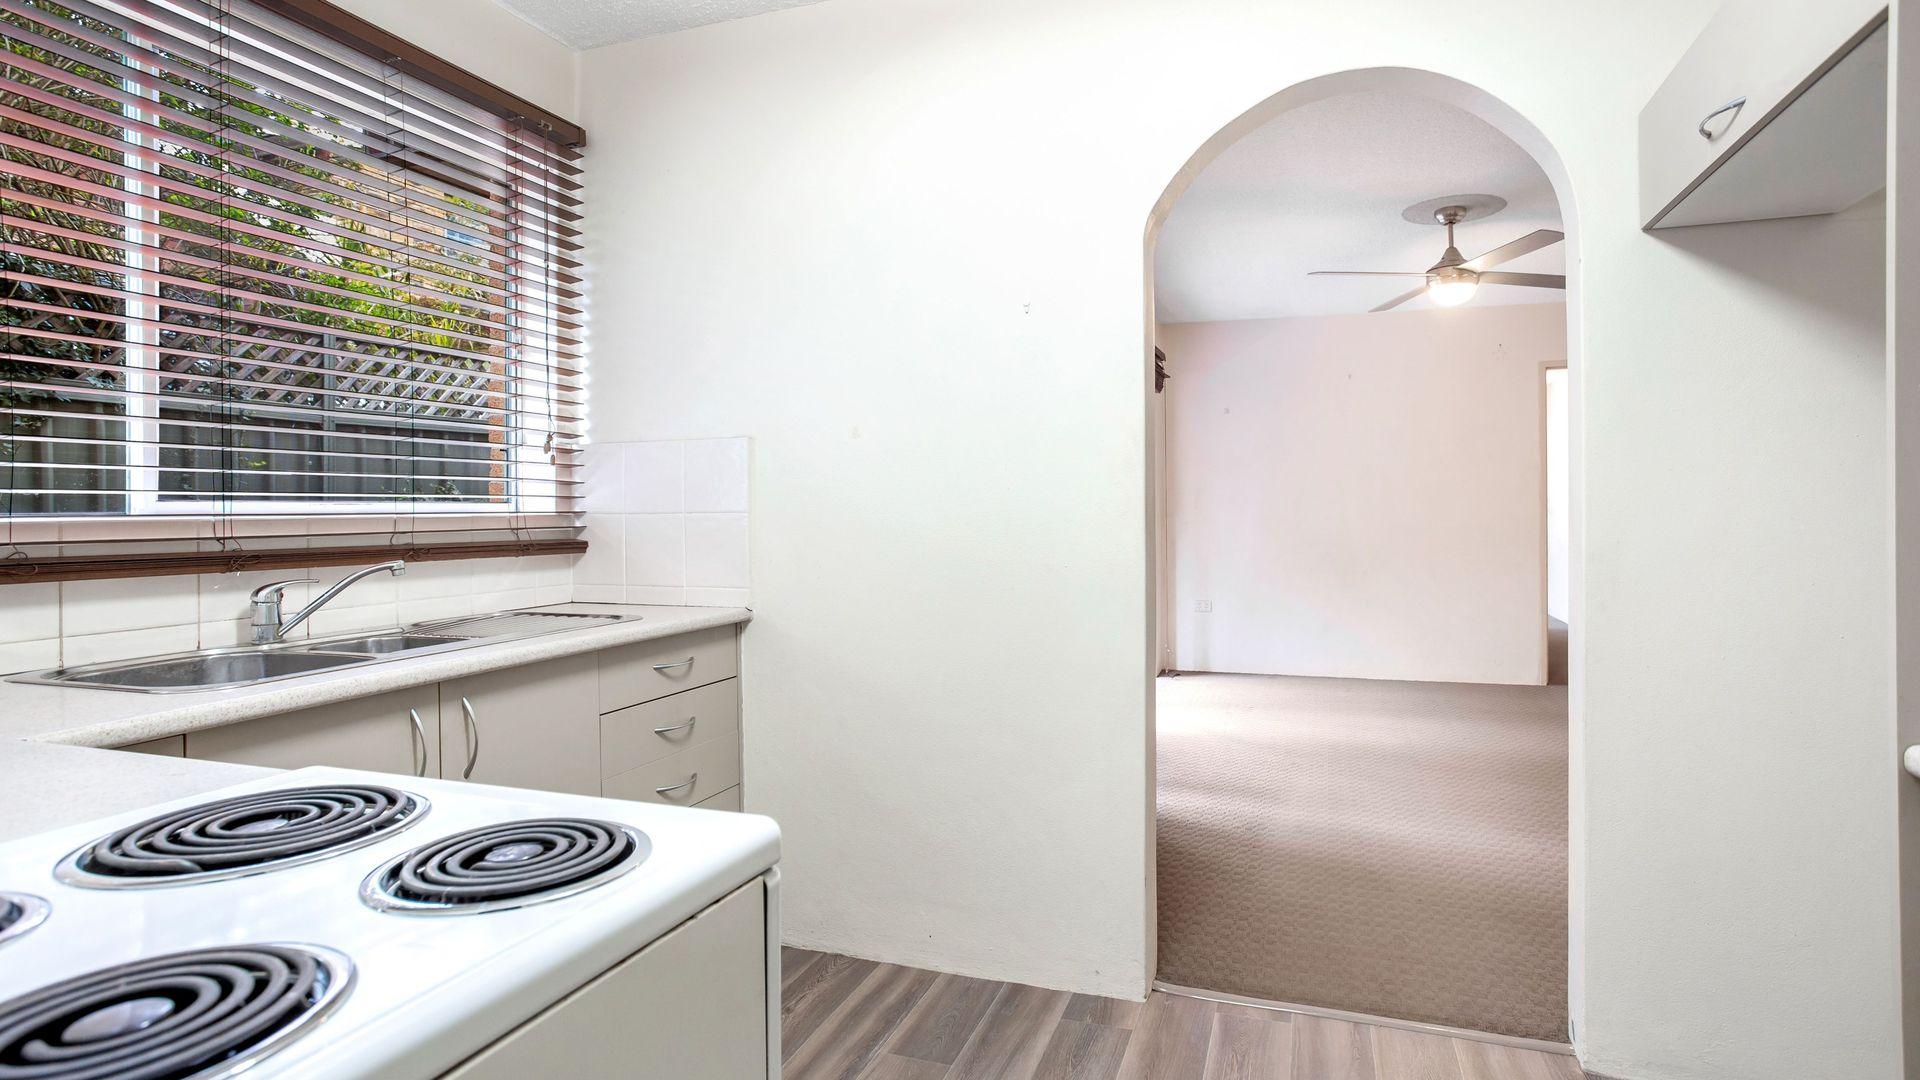 2/8 Messines Street, Shoal Bay NSW 2315, Image 2